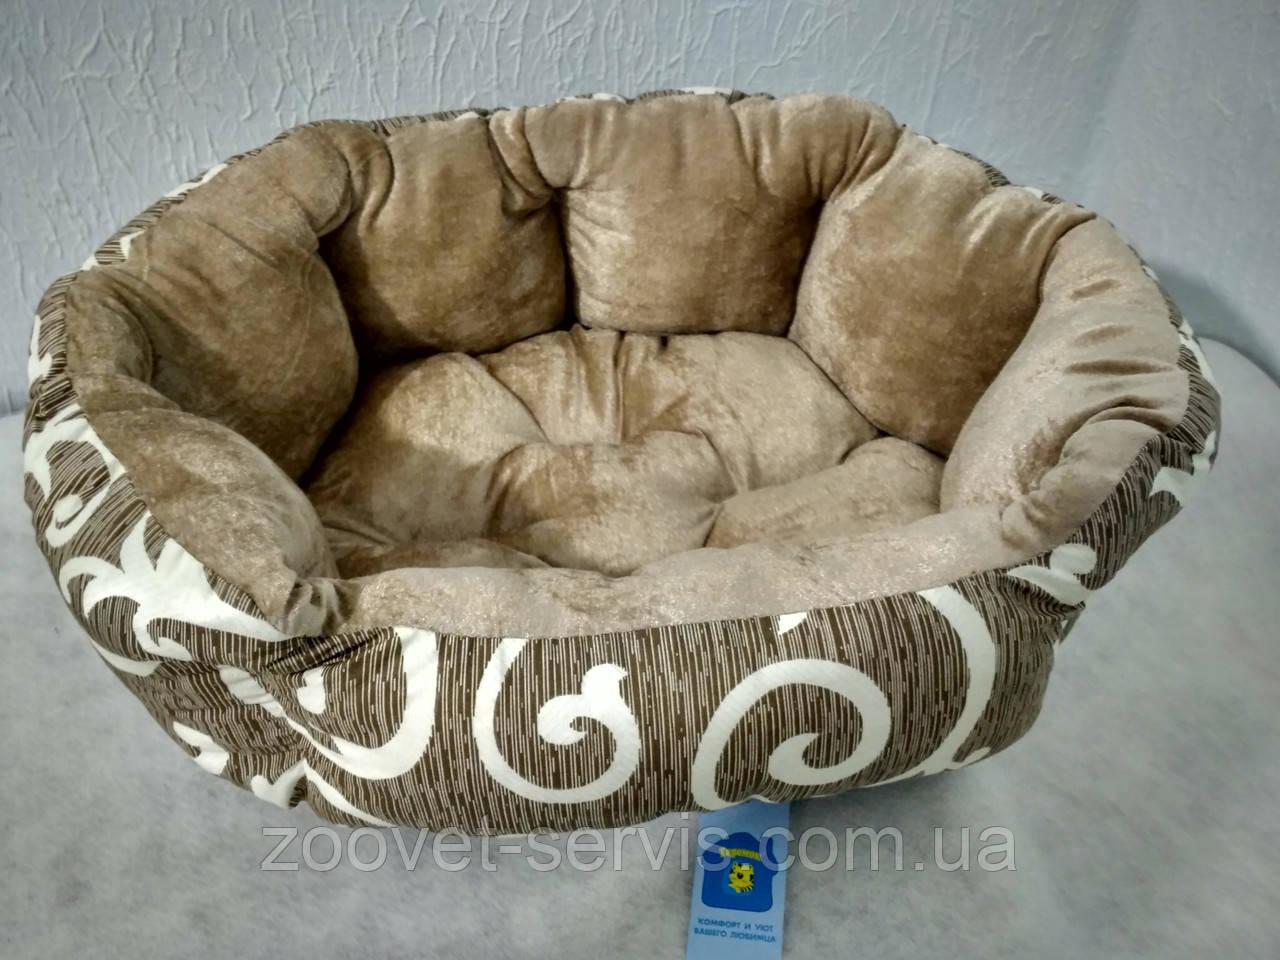 Лежак - диван для собак Теремок Элегант 2 50х40х18 см (0406)